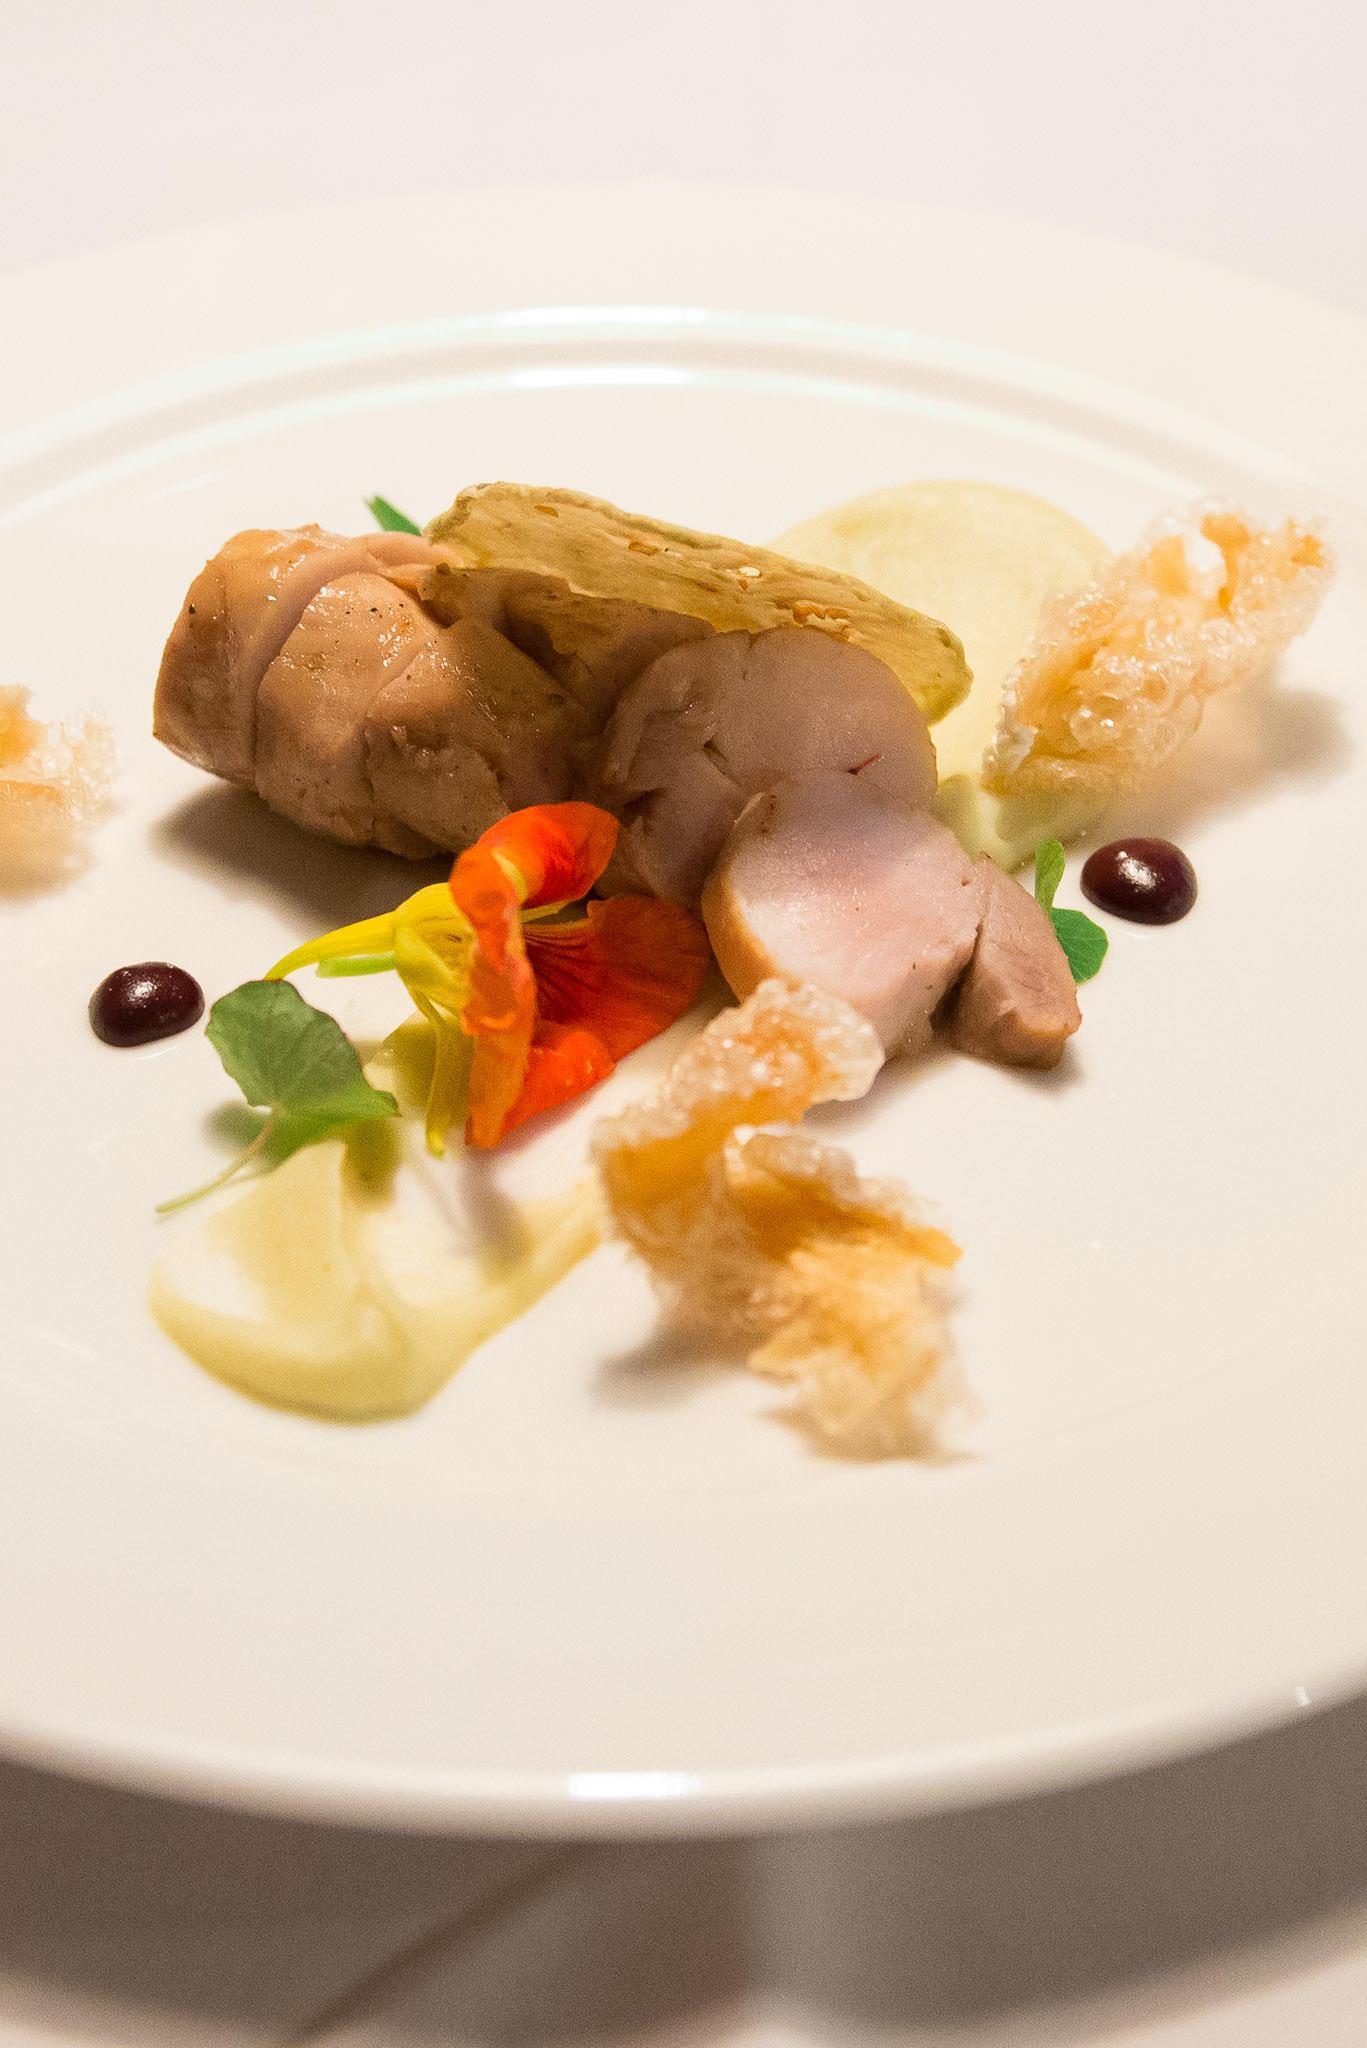 Glazed pork, white eggplant caviar, mustard, cassis, eggplant crisp